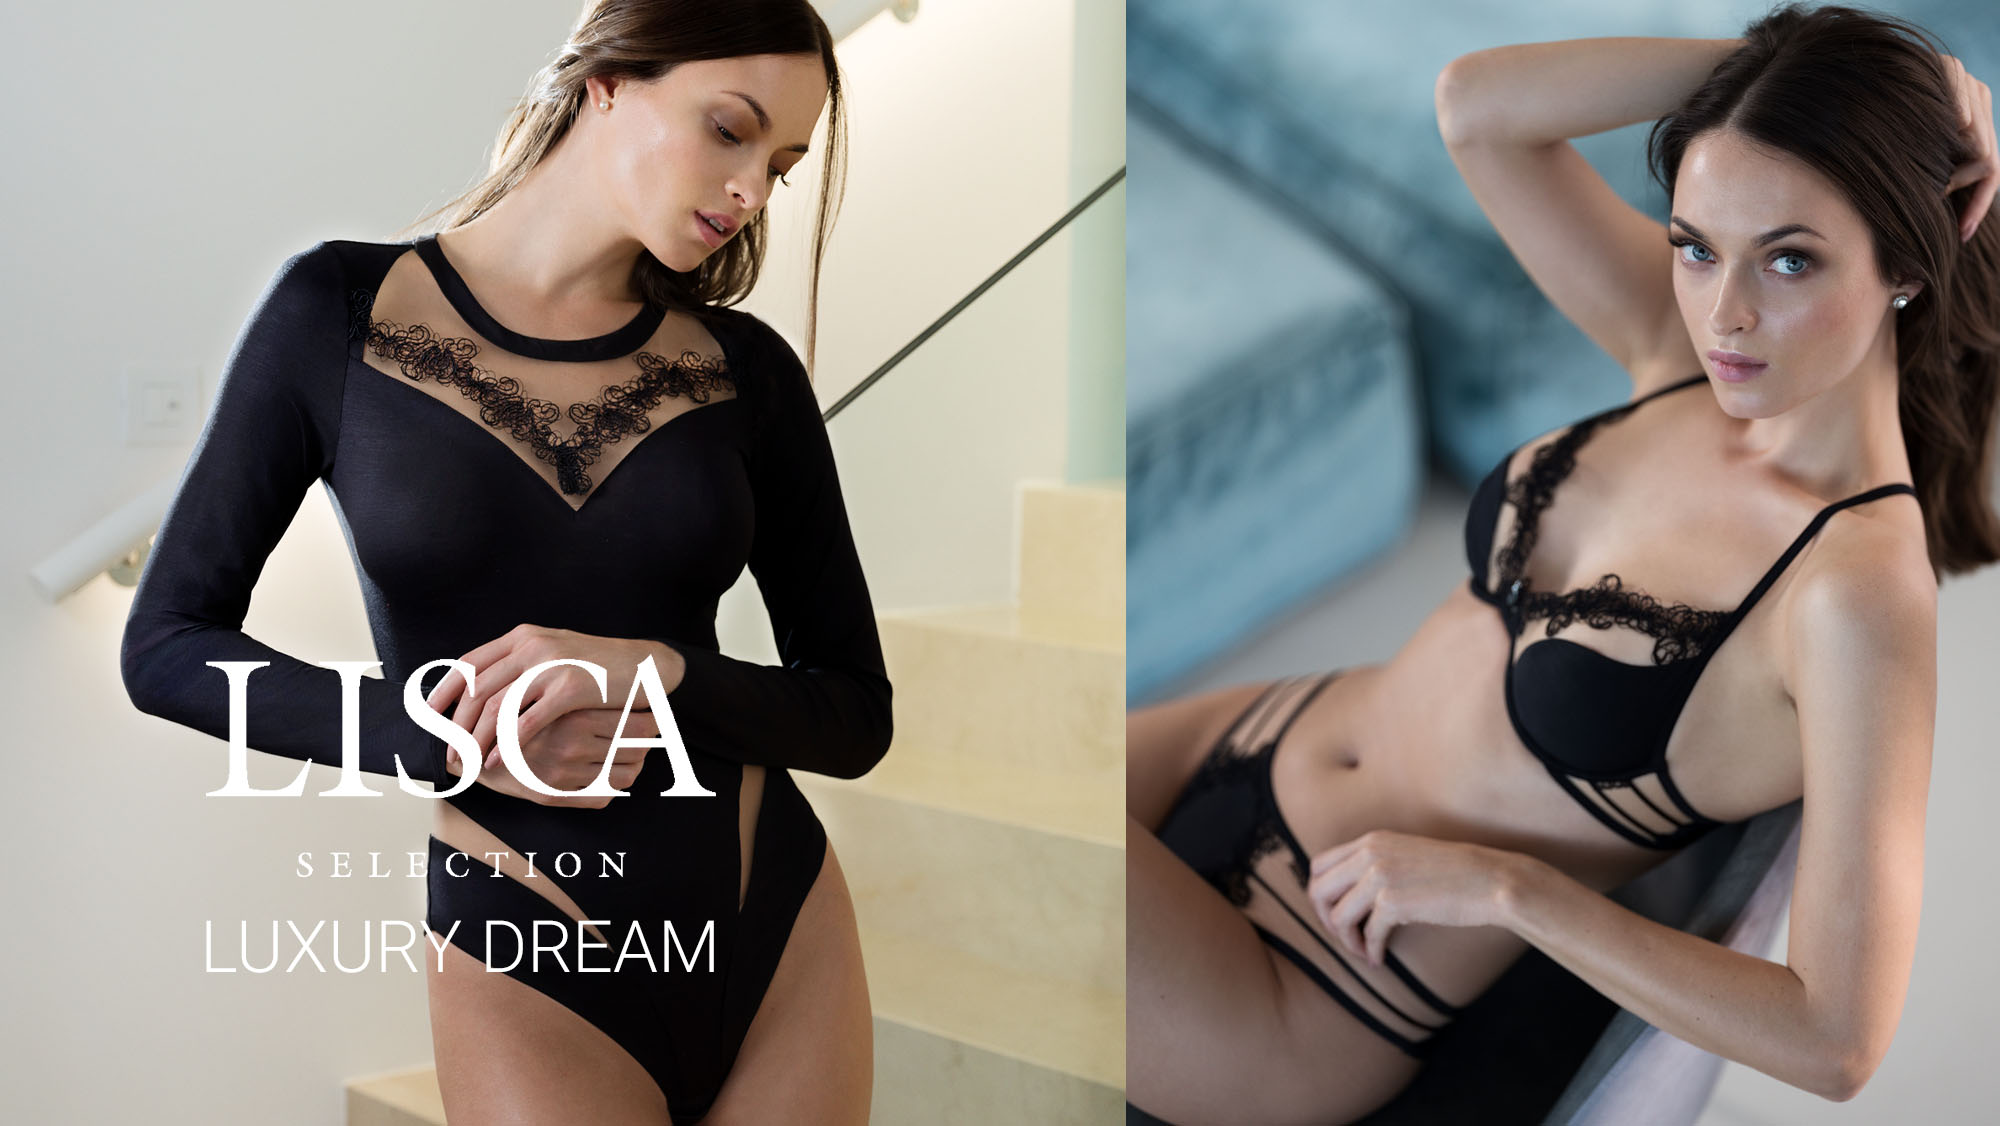 Lisca Selection Luxury Dream